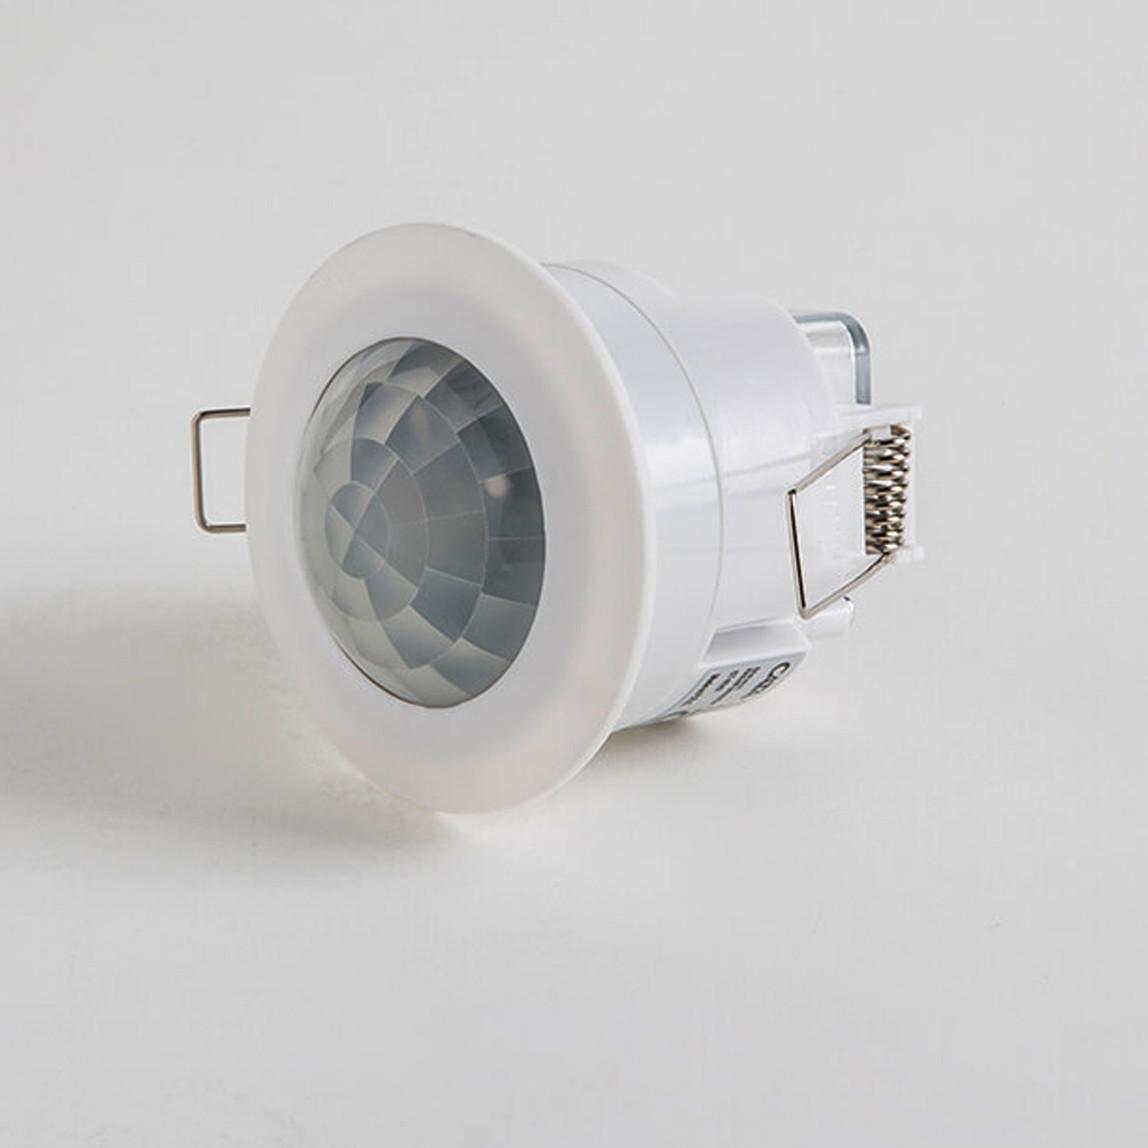 360 Derece. Sıva Altı Radar Sensör